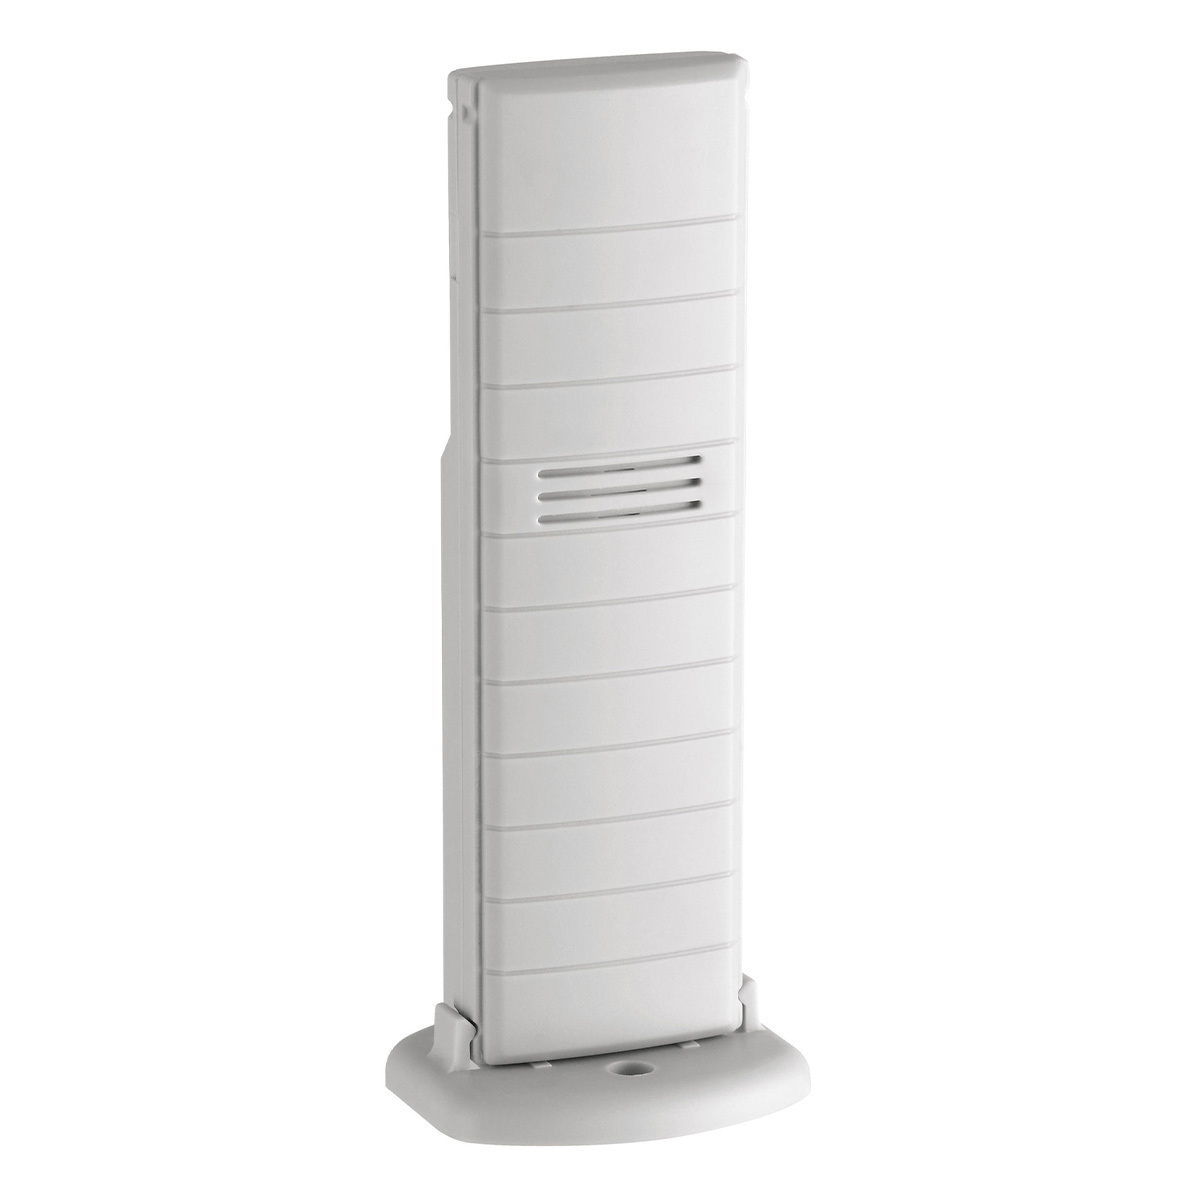 30-3037-01-it-funk-thermometer-basic-sender-1200x1200px.jpg